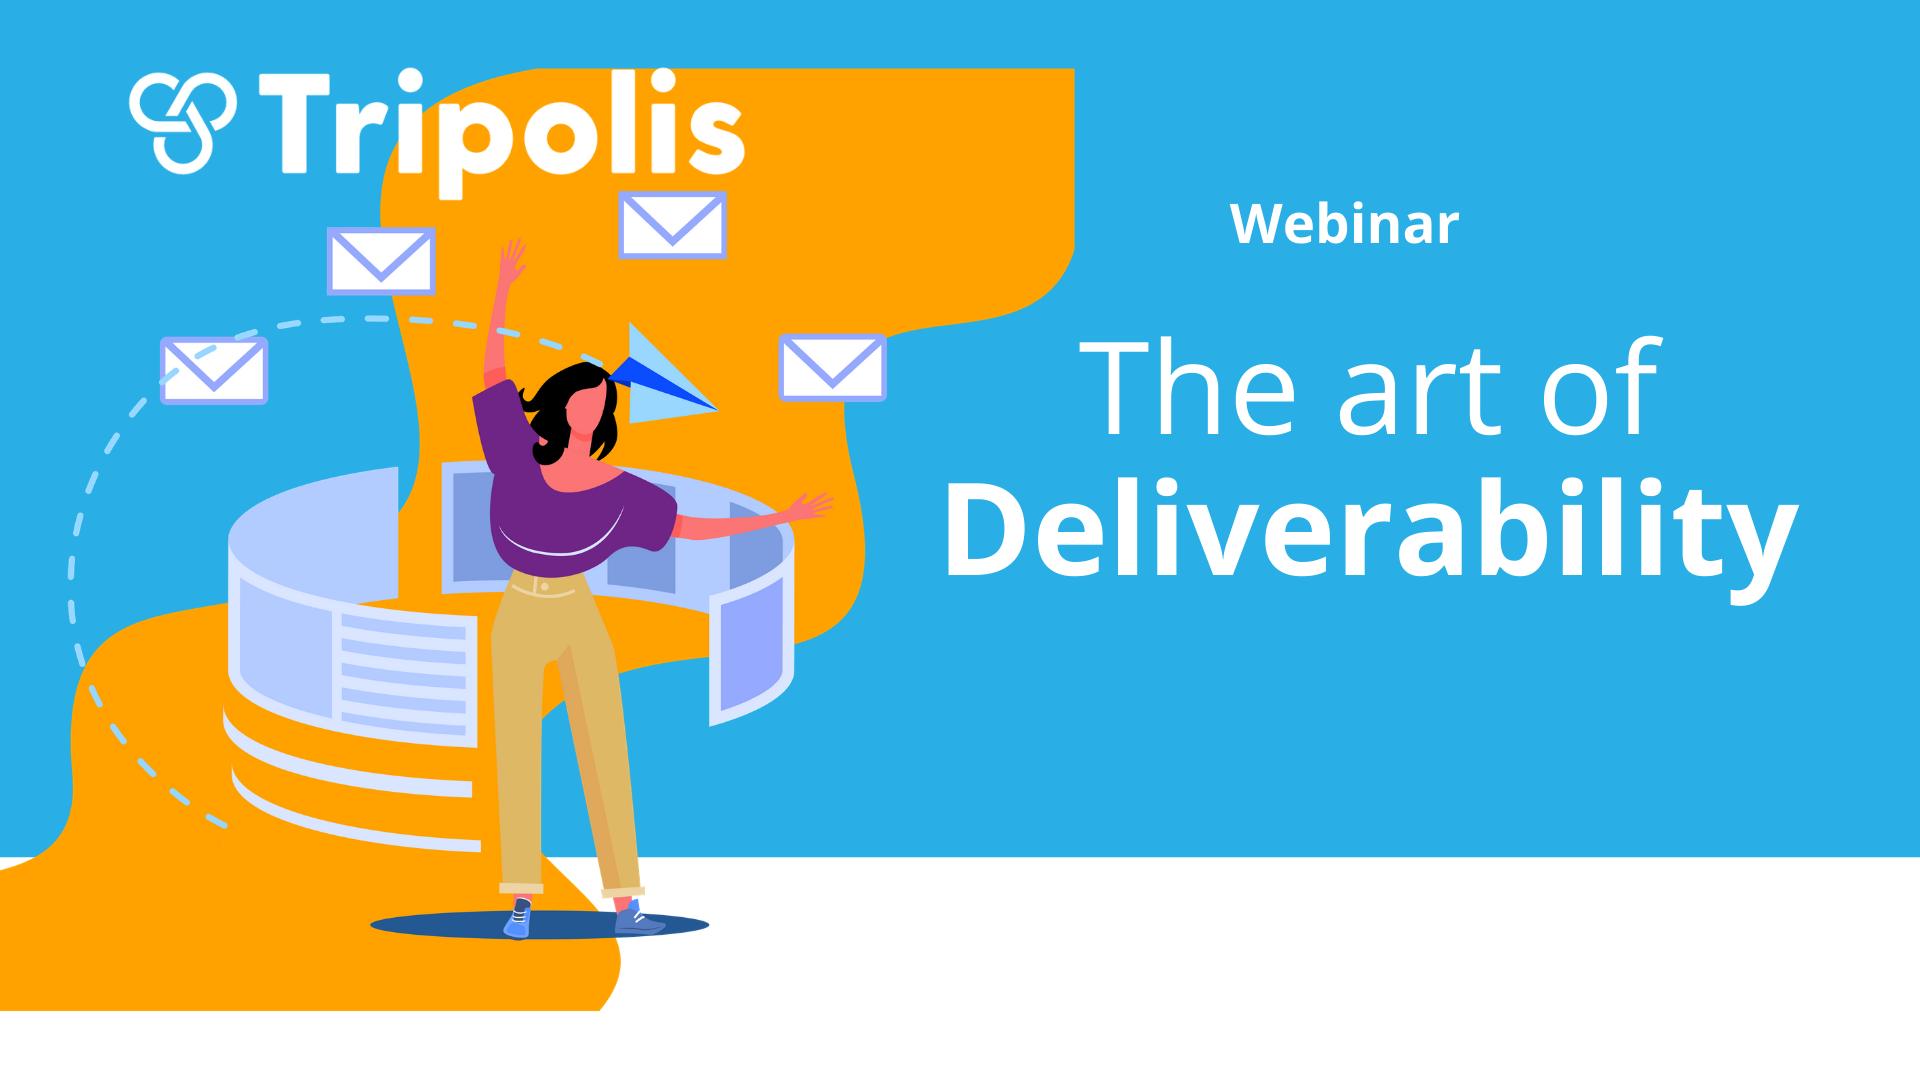 Webinar the art of deliverability